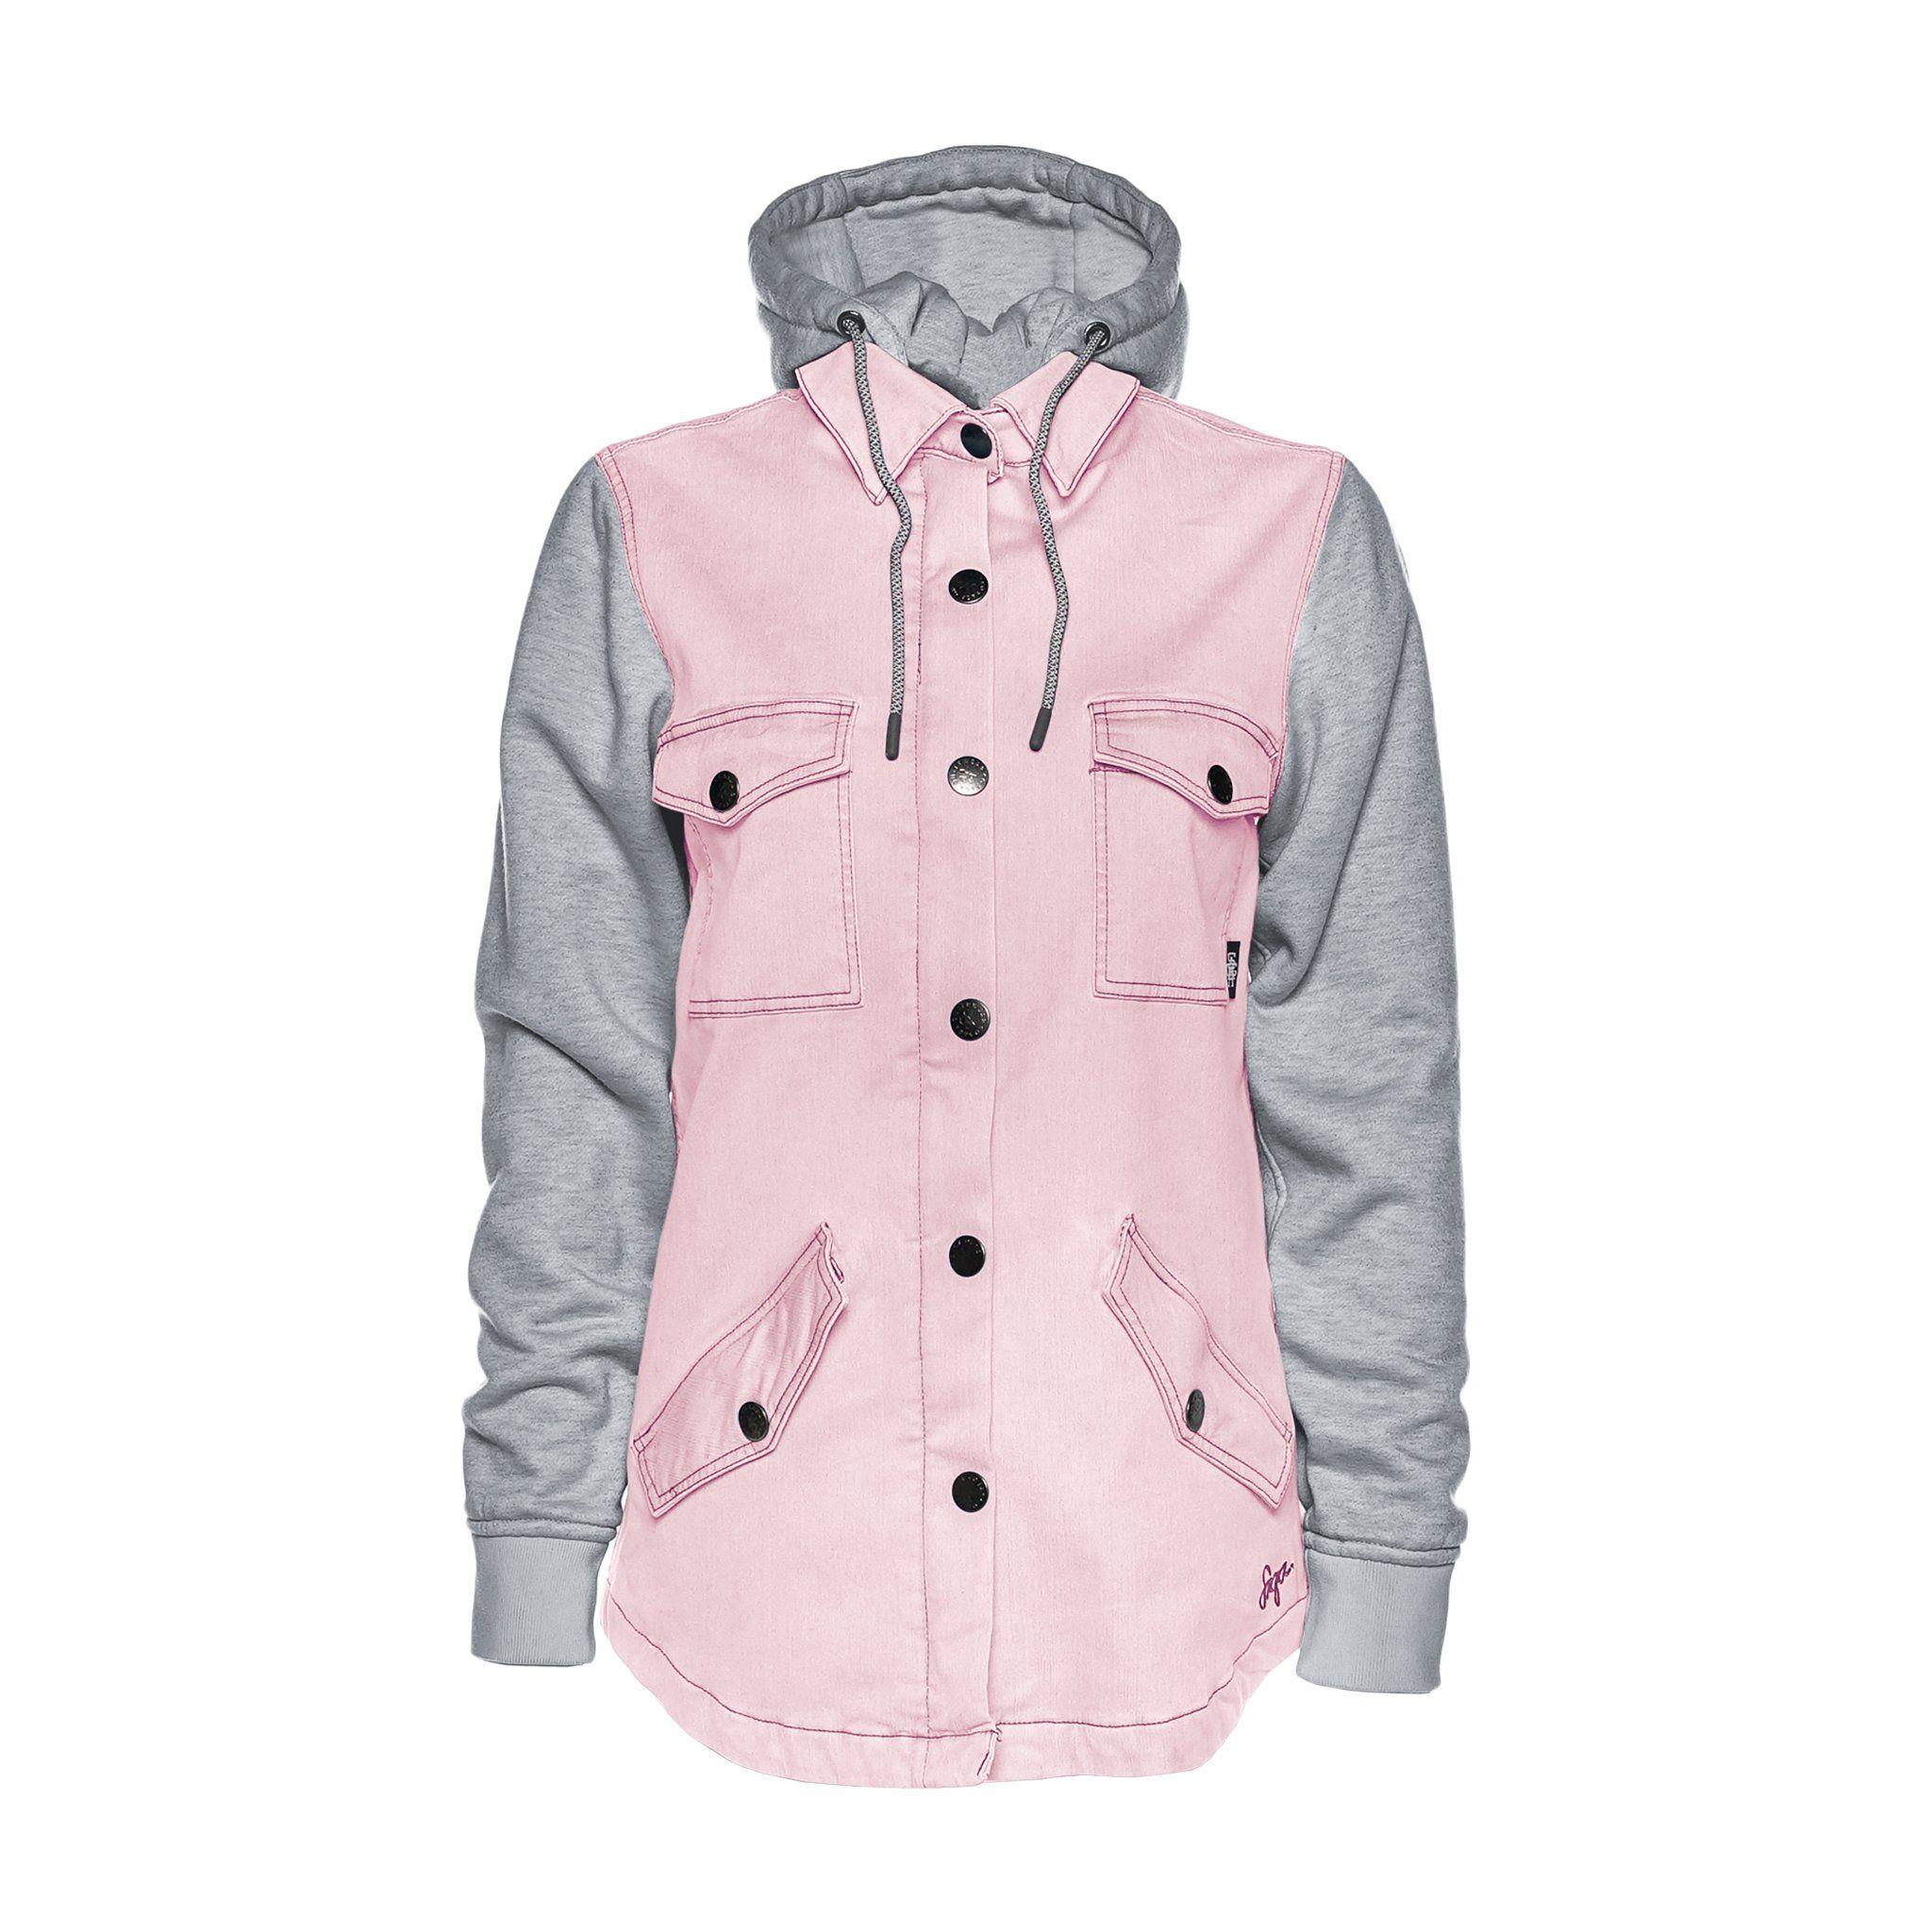 Eleanor Insulated Jacket Women S Insulated Jacket Women Jackets For Women Insulated Jackets [ 2048 x 2048 Pixel ]